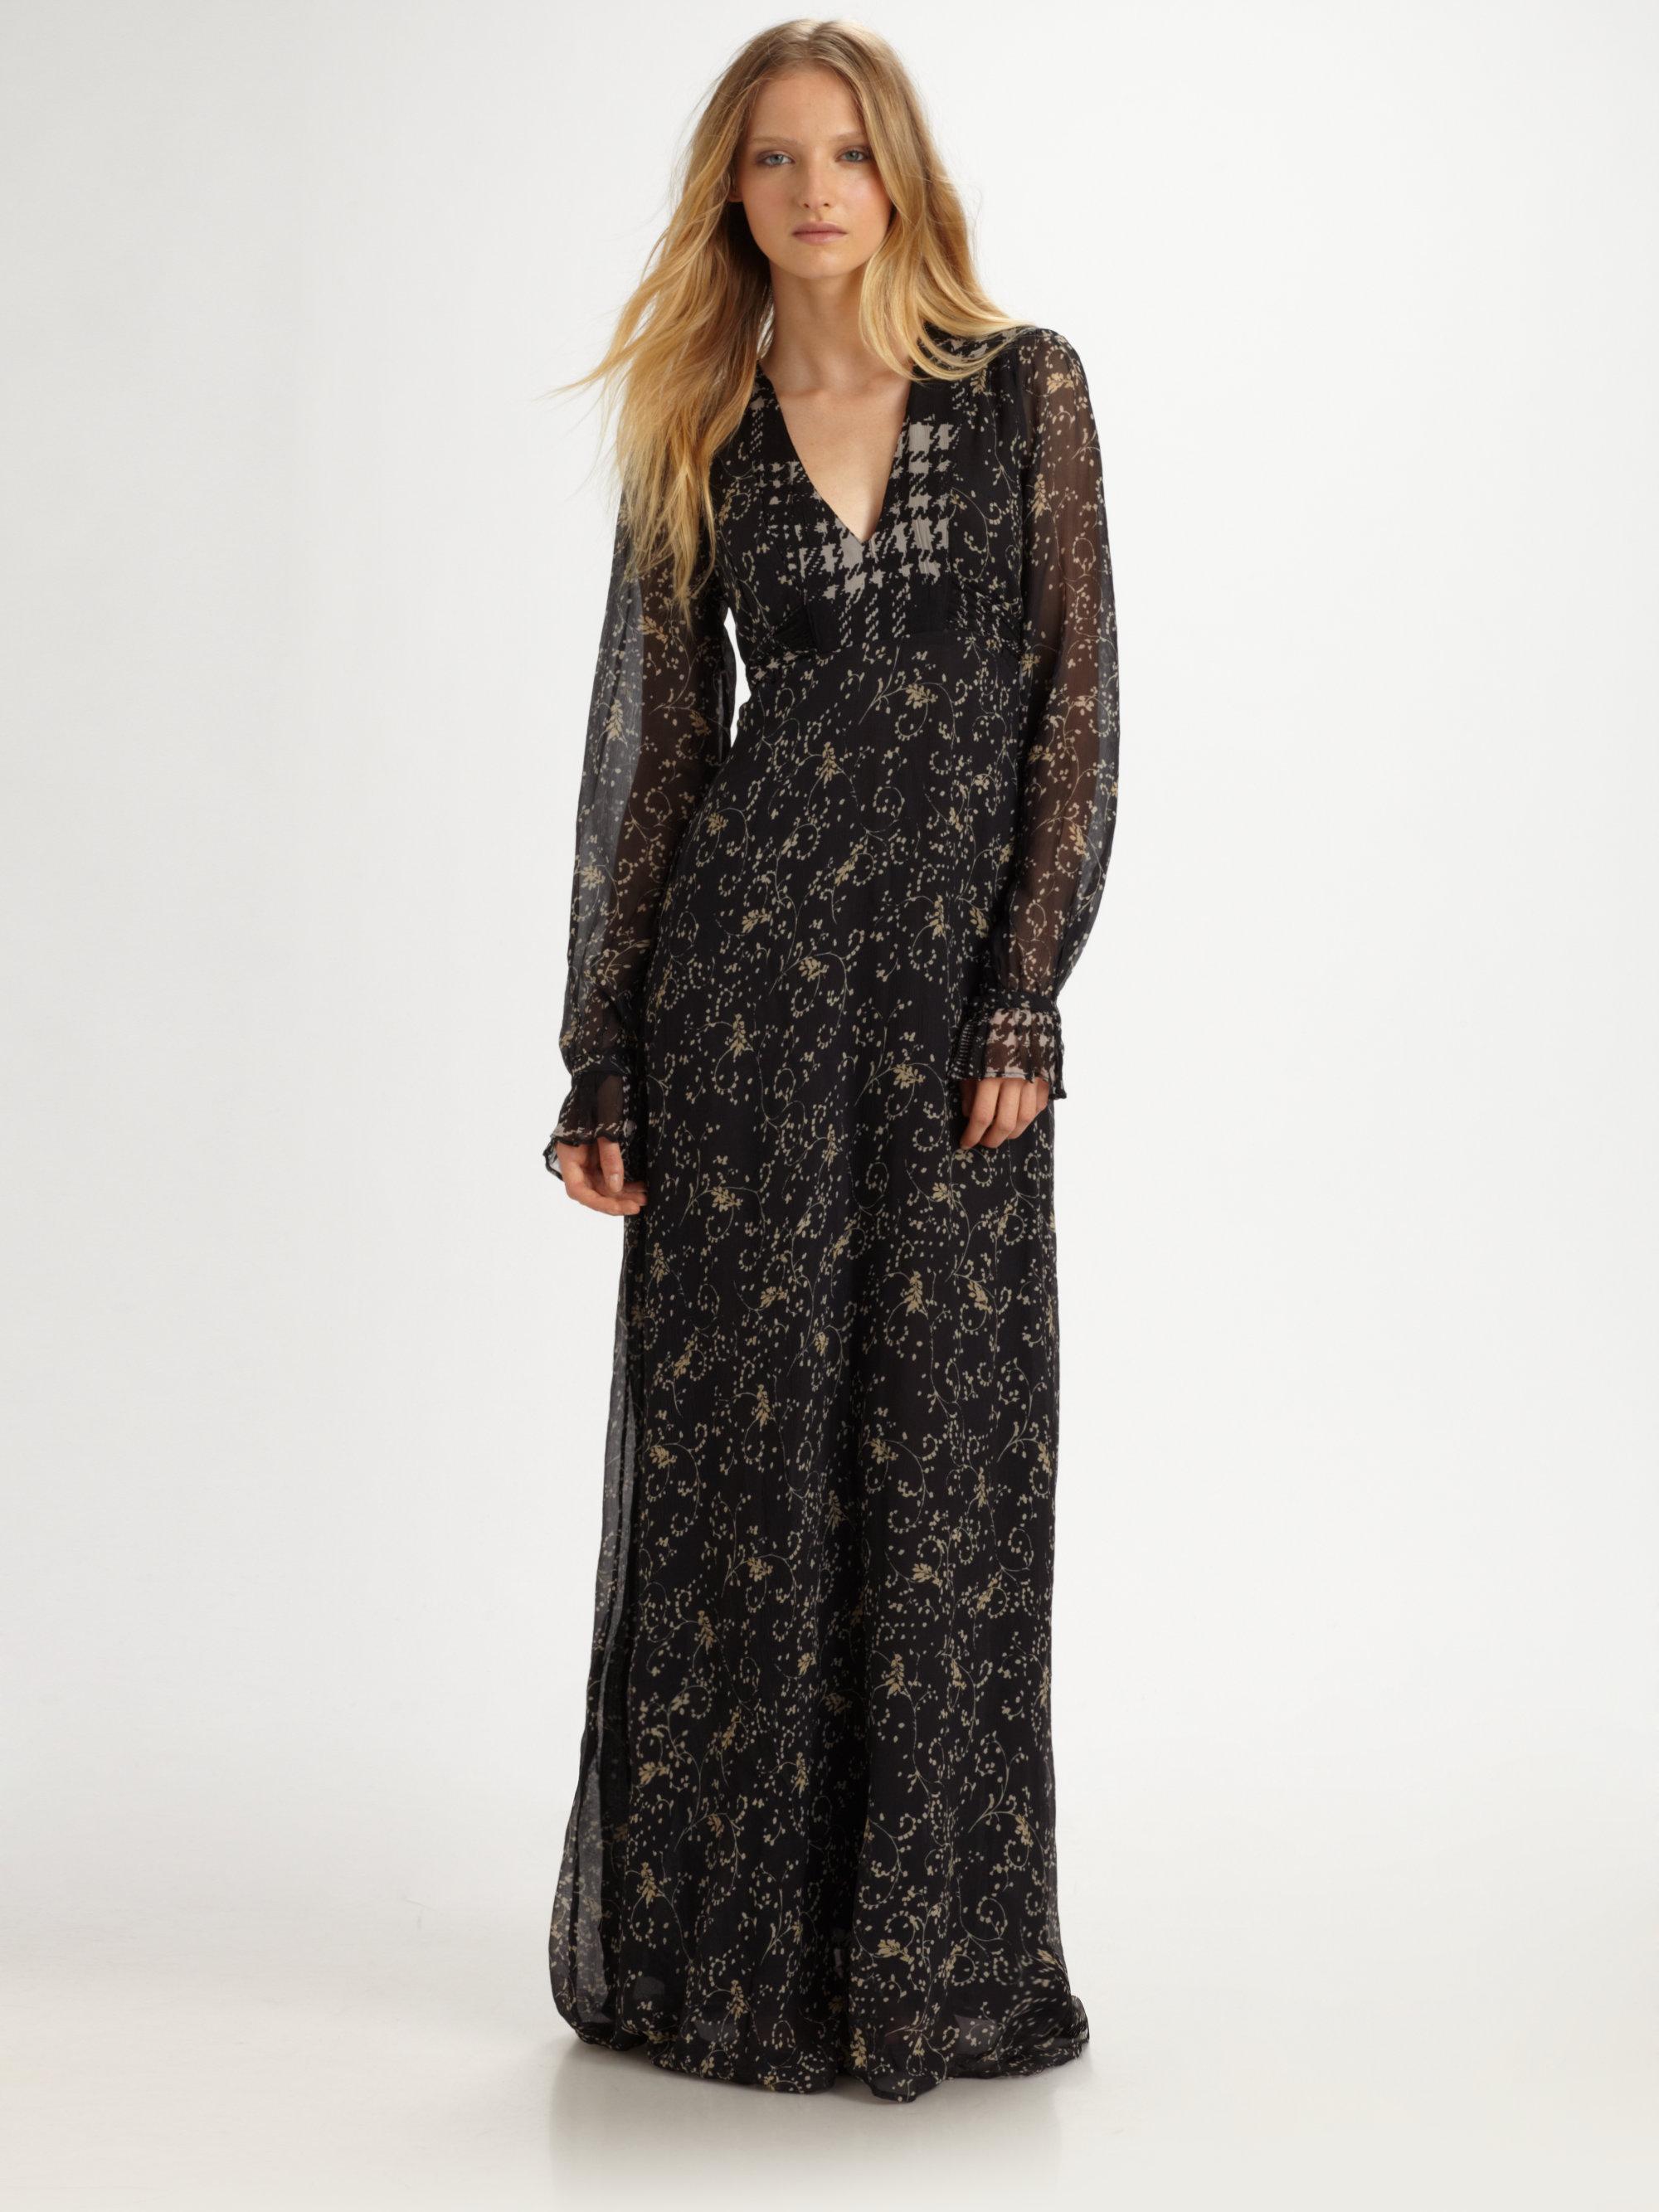 6b8137522ba54 Winter Kate Sweet Rose Maxi Dress in Black - Lyst